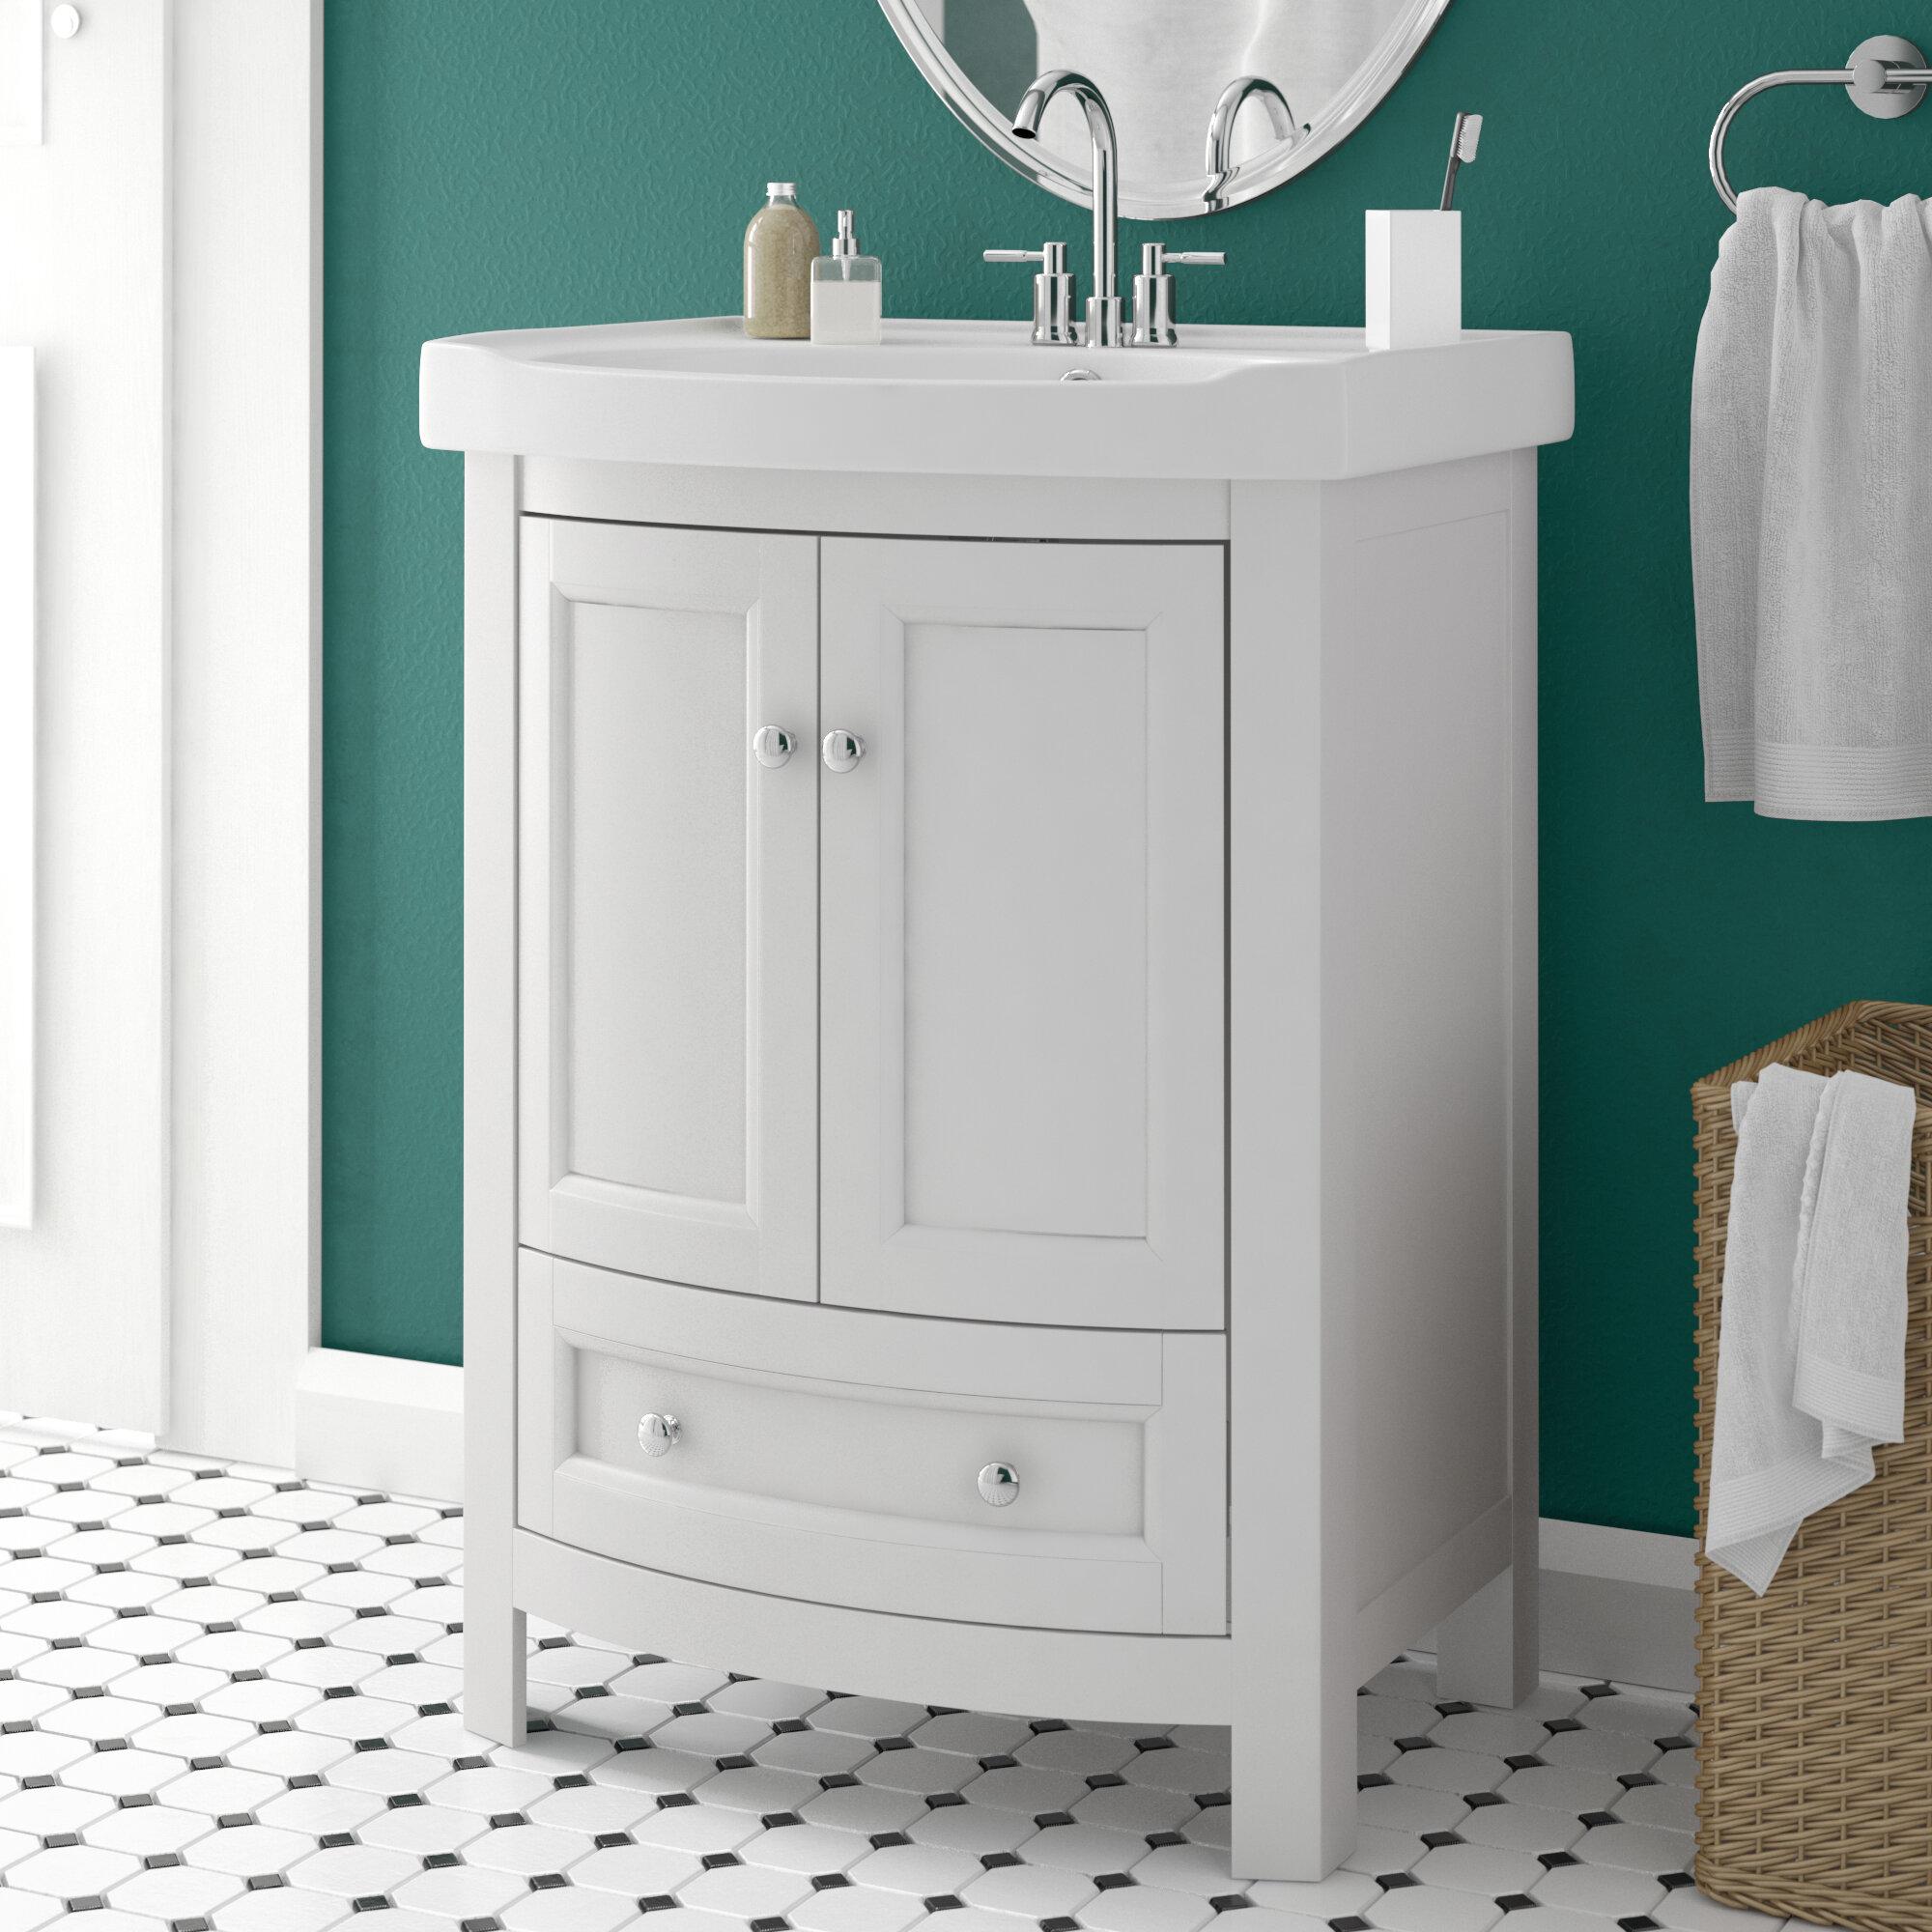 27 Inch All Bathroom Vanities You Ll Love In 2021 Wayfair